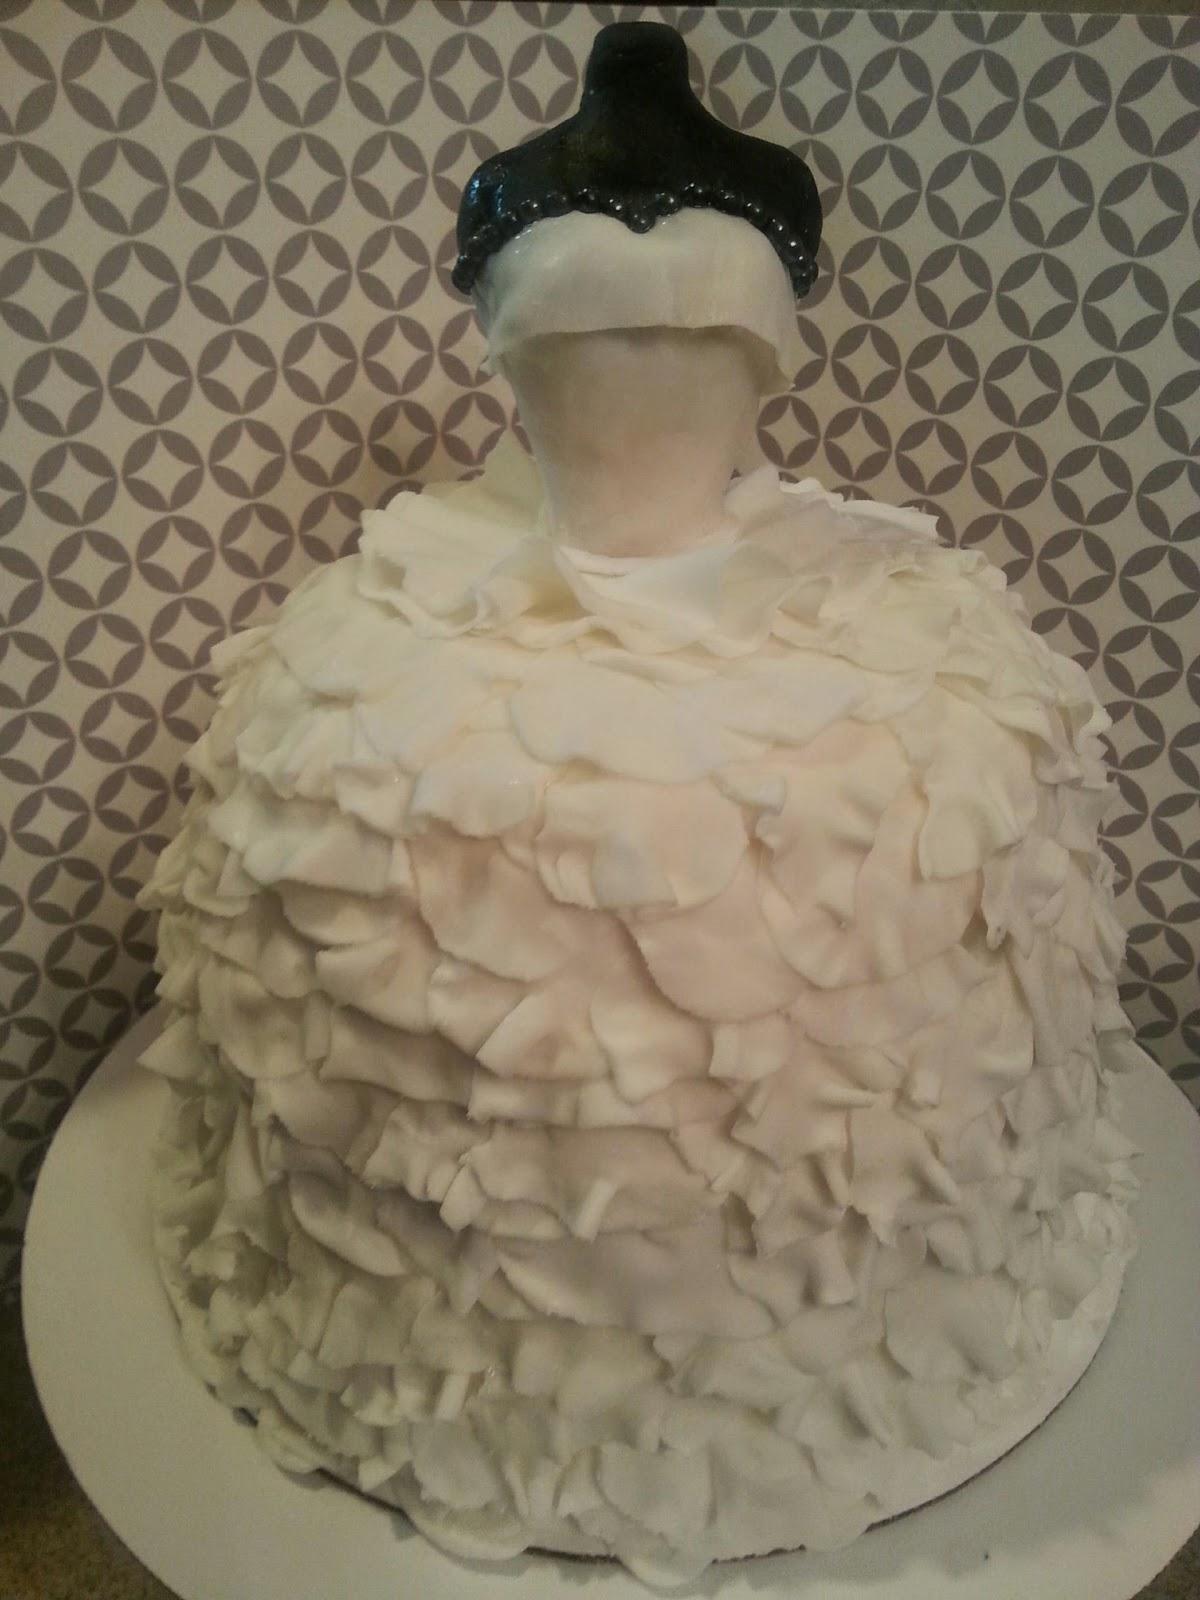 Wedding Dress Cupcake Cake 5 Spectacular Wedding Dress Cake and